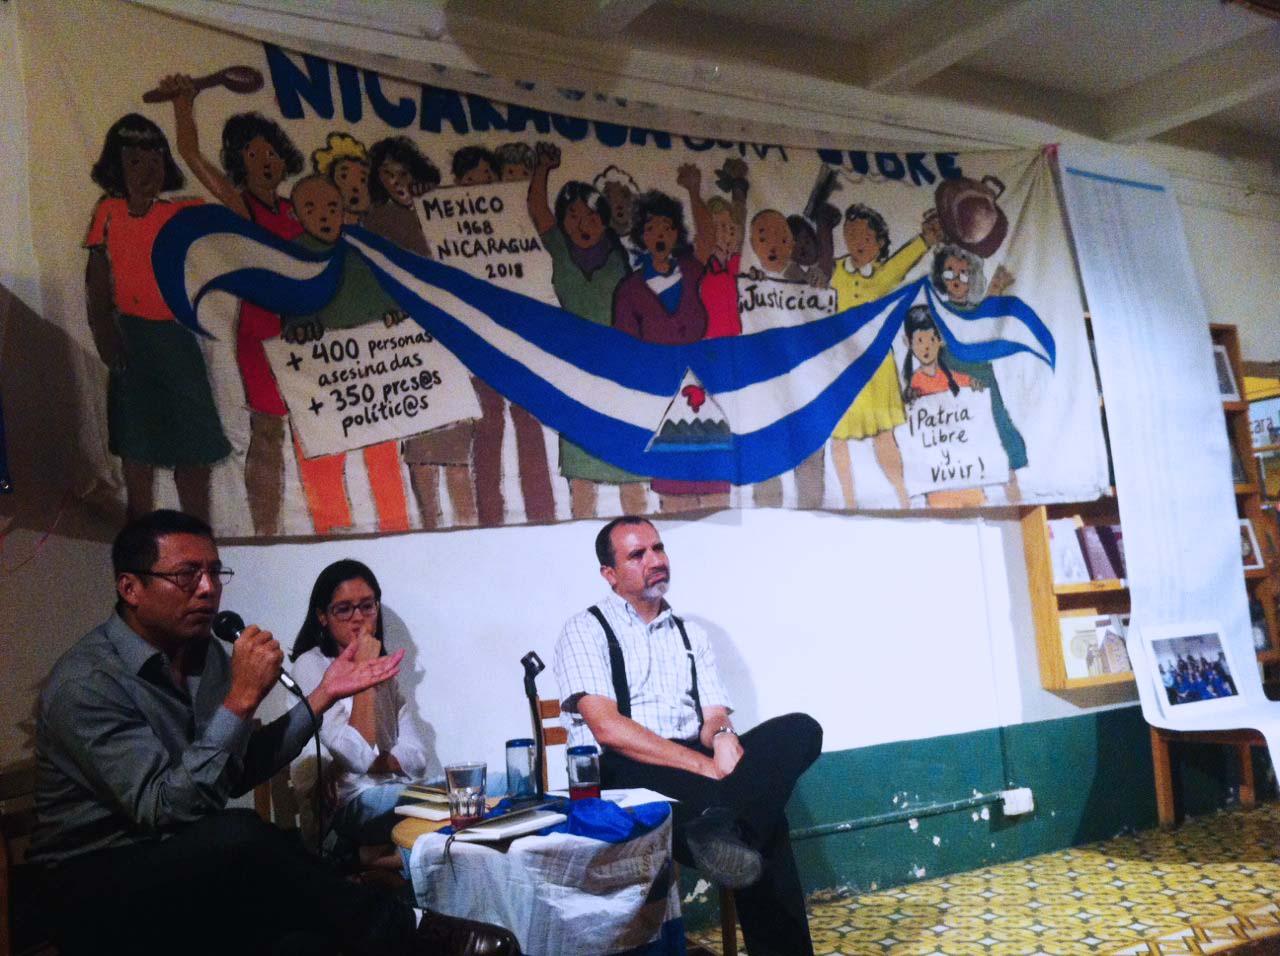 Sigue represión en Nicaragua, miles de nicaragüenses buscan refugio